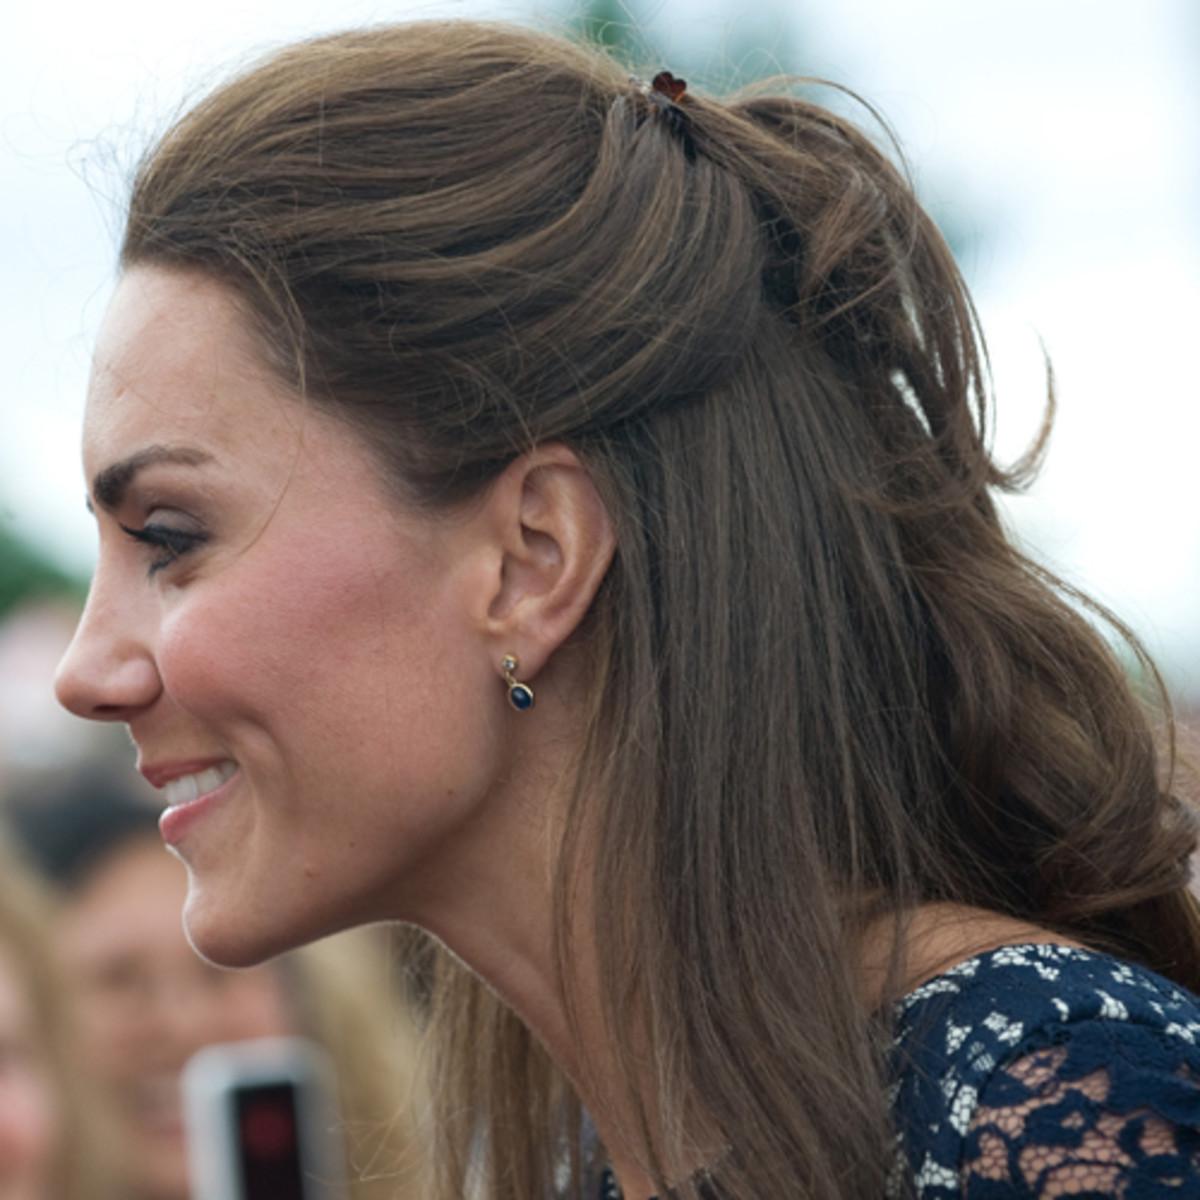 Kate-Middleton-Canada-2011-half-up-half-down-hair